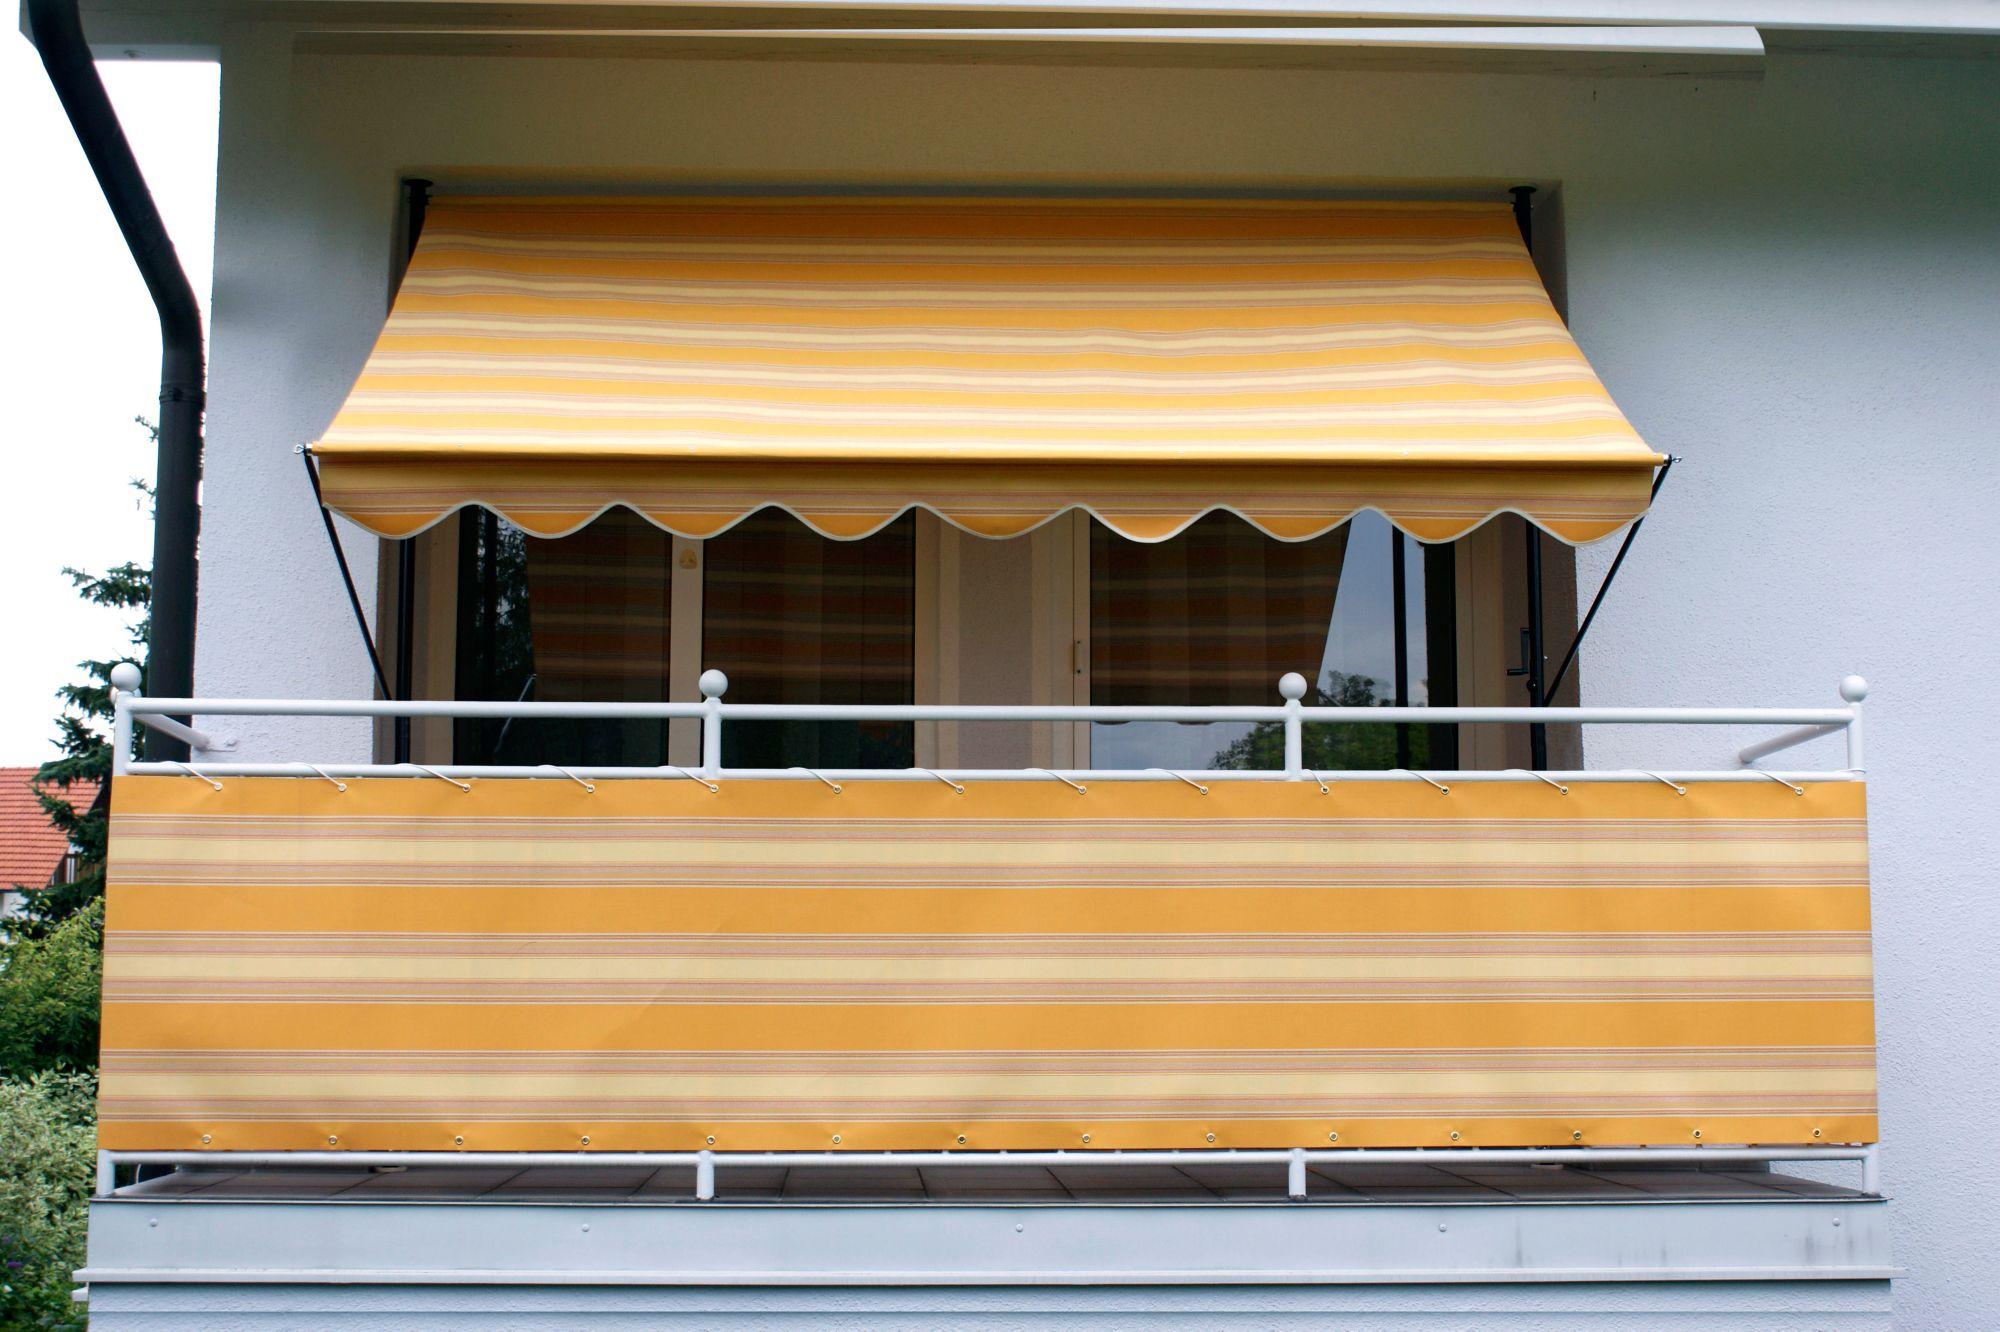 Outdoor Kuche Ohne Uberdachung Hochbeet Plant Inn Kompakt Schwab